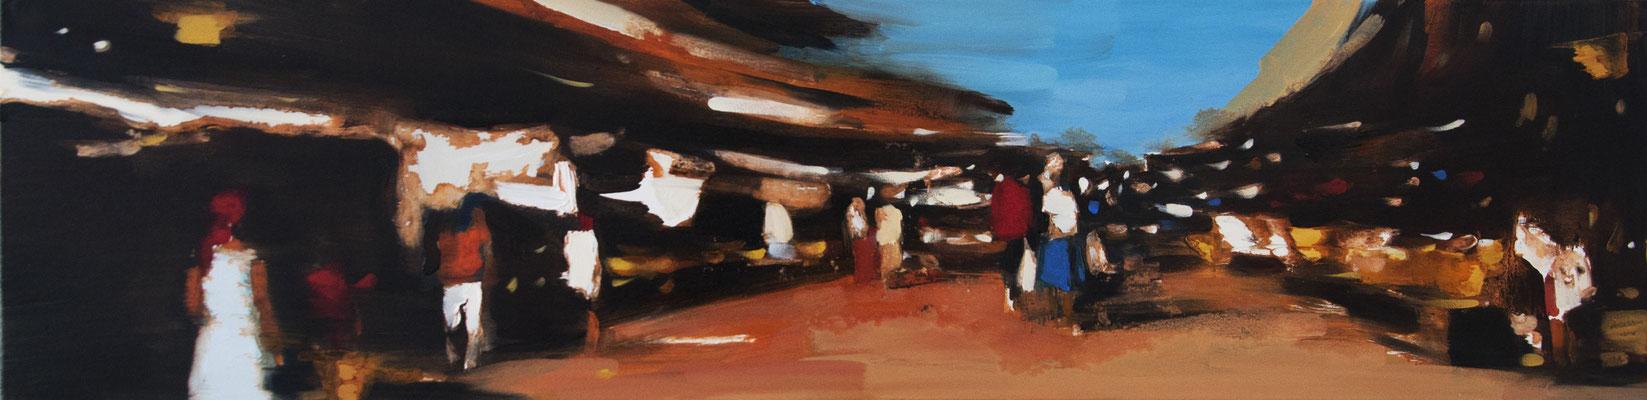 RENATA TUMAROVA  I  Summerheat  I  Öl auf Leinwand  I  30 x 120 cm